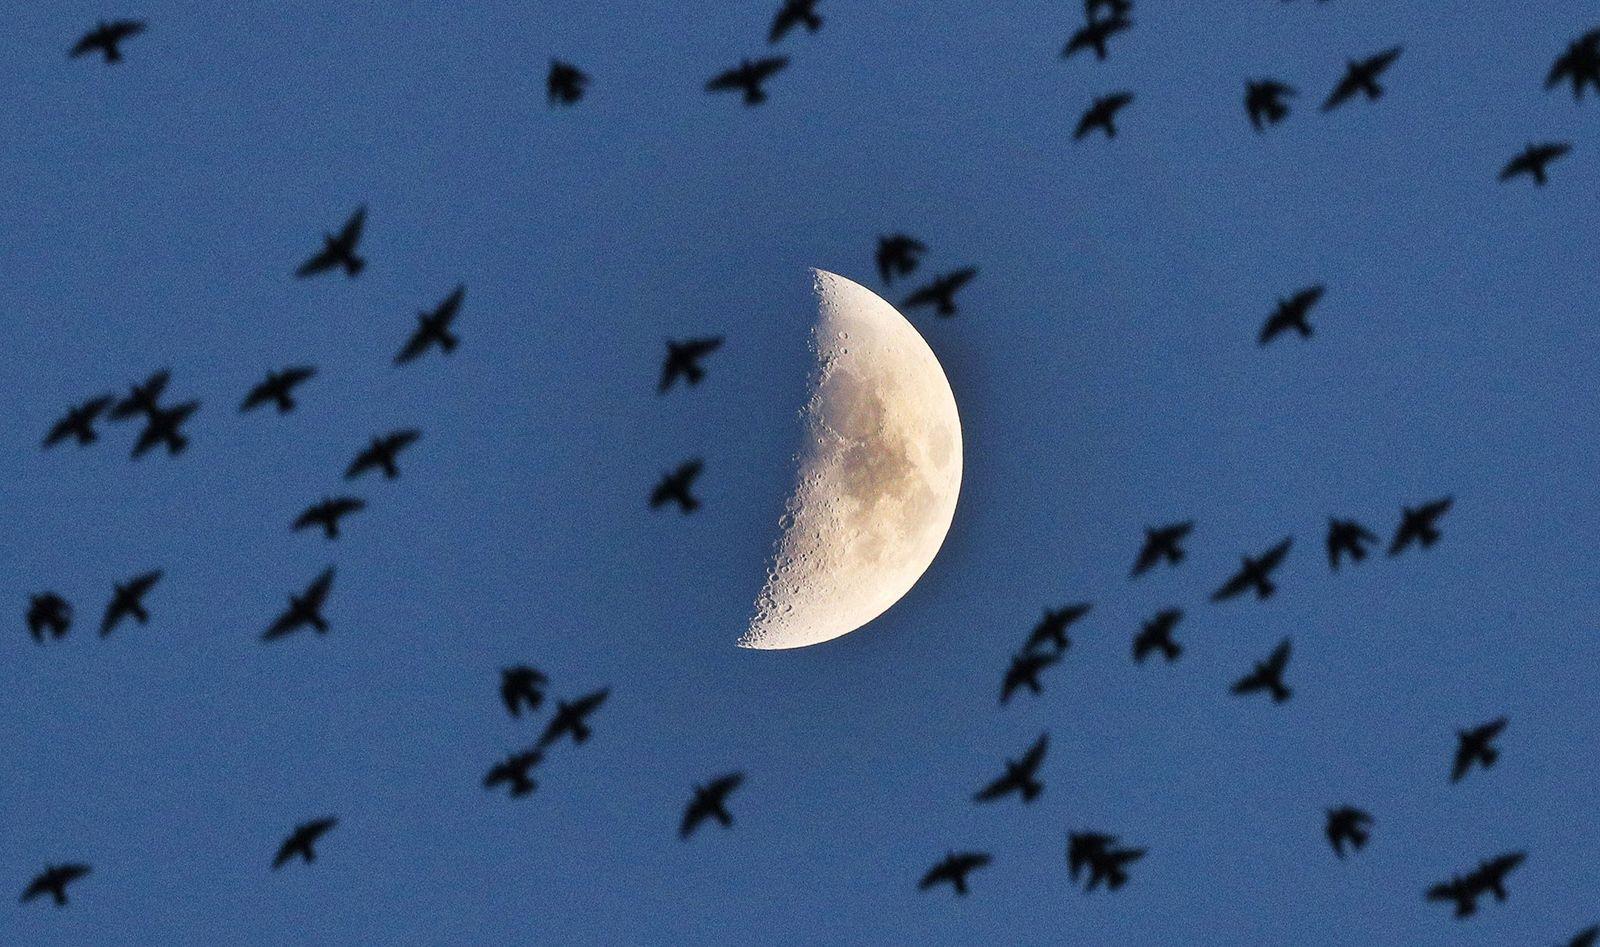 Faszination Mond